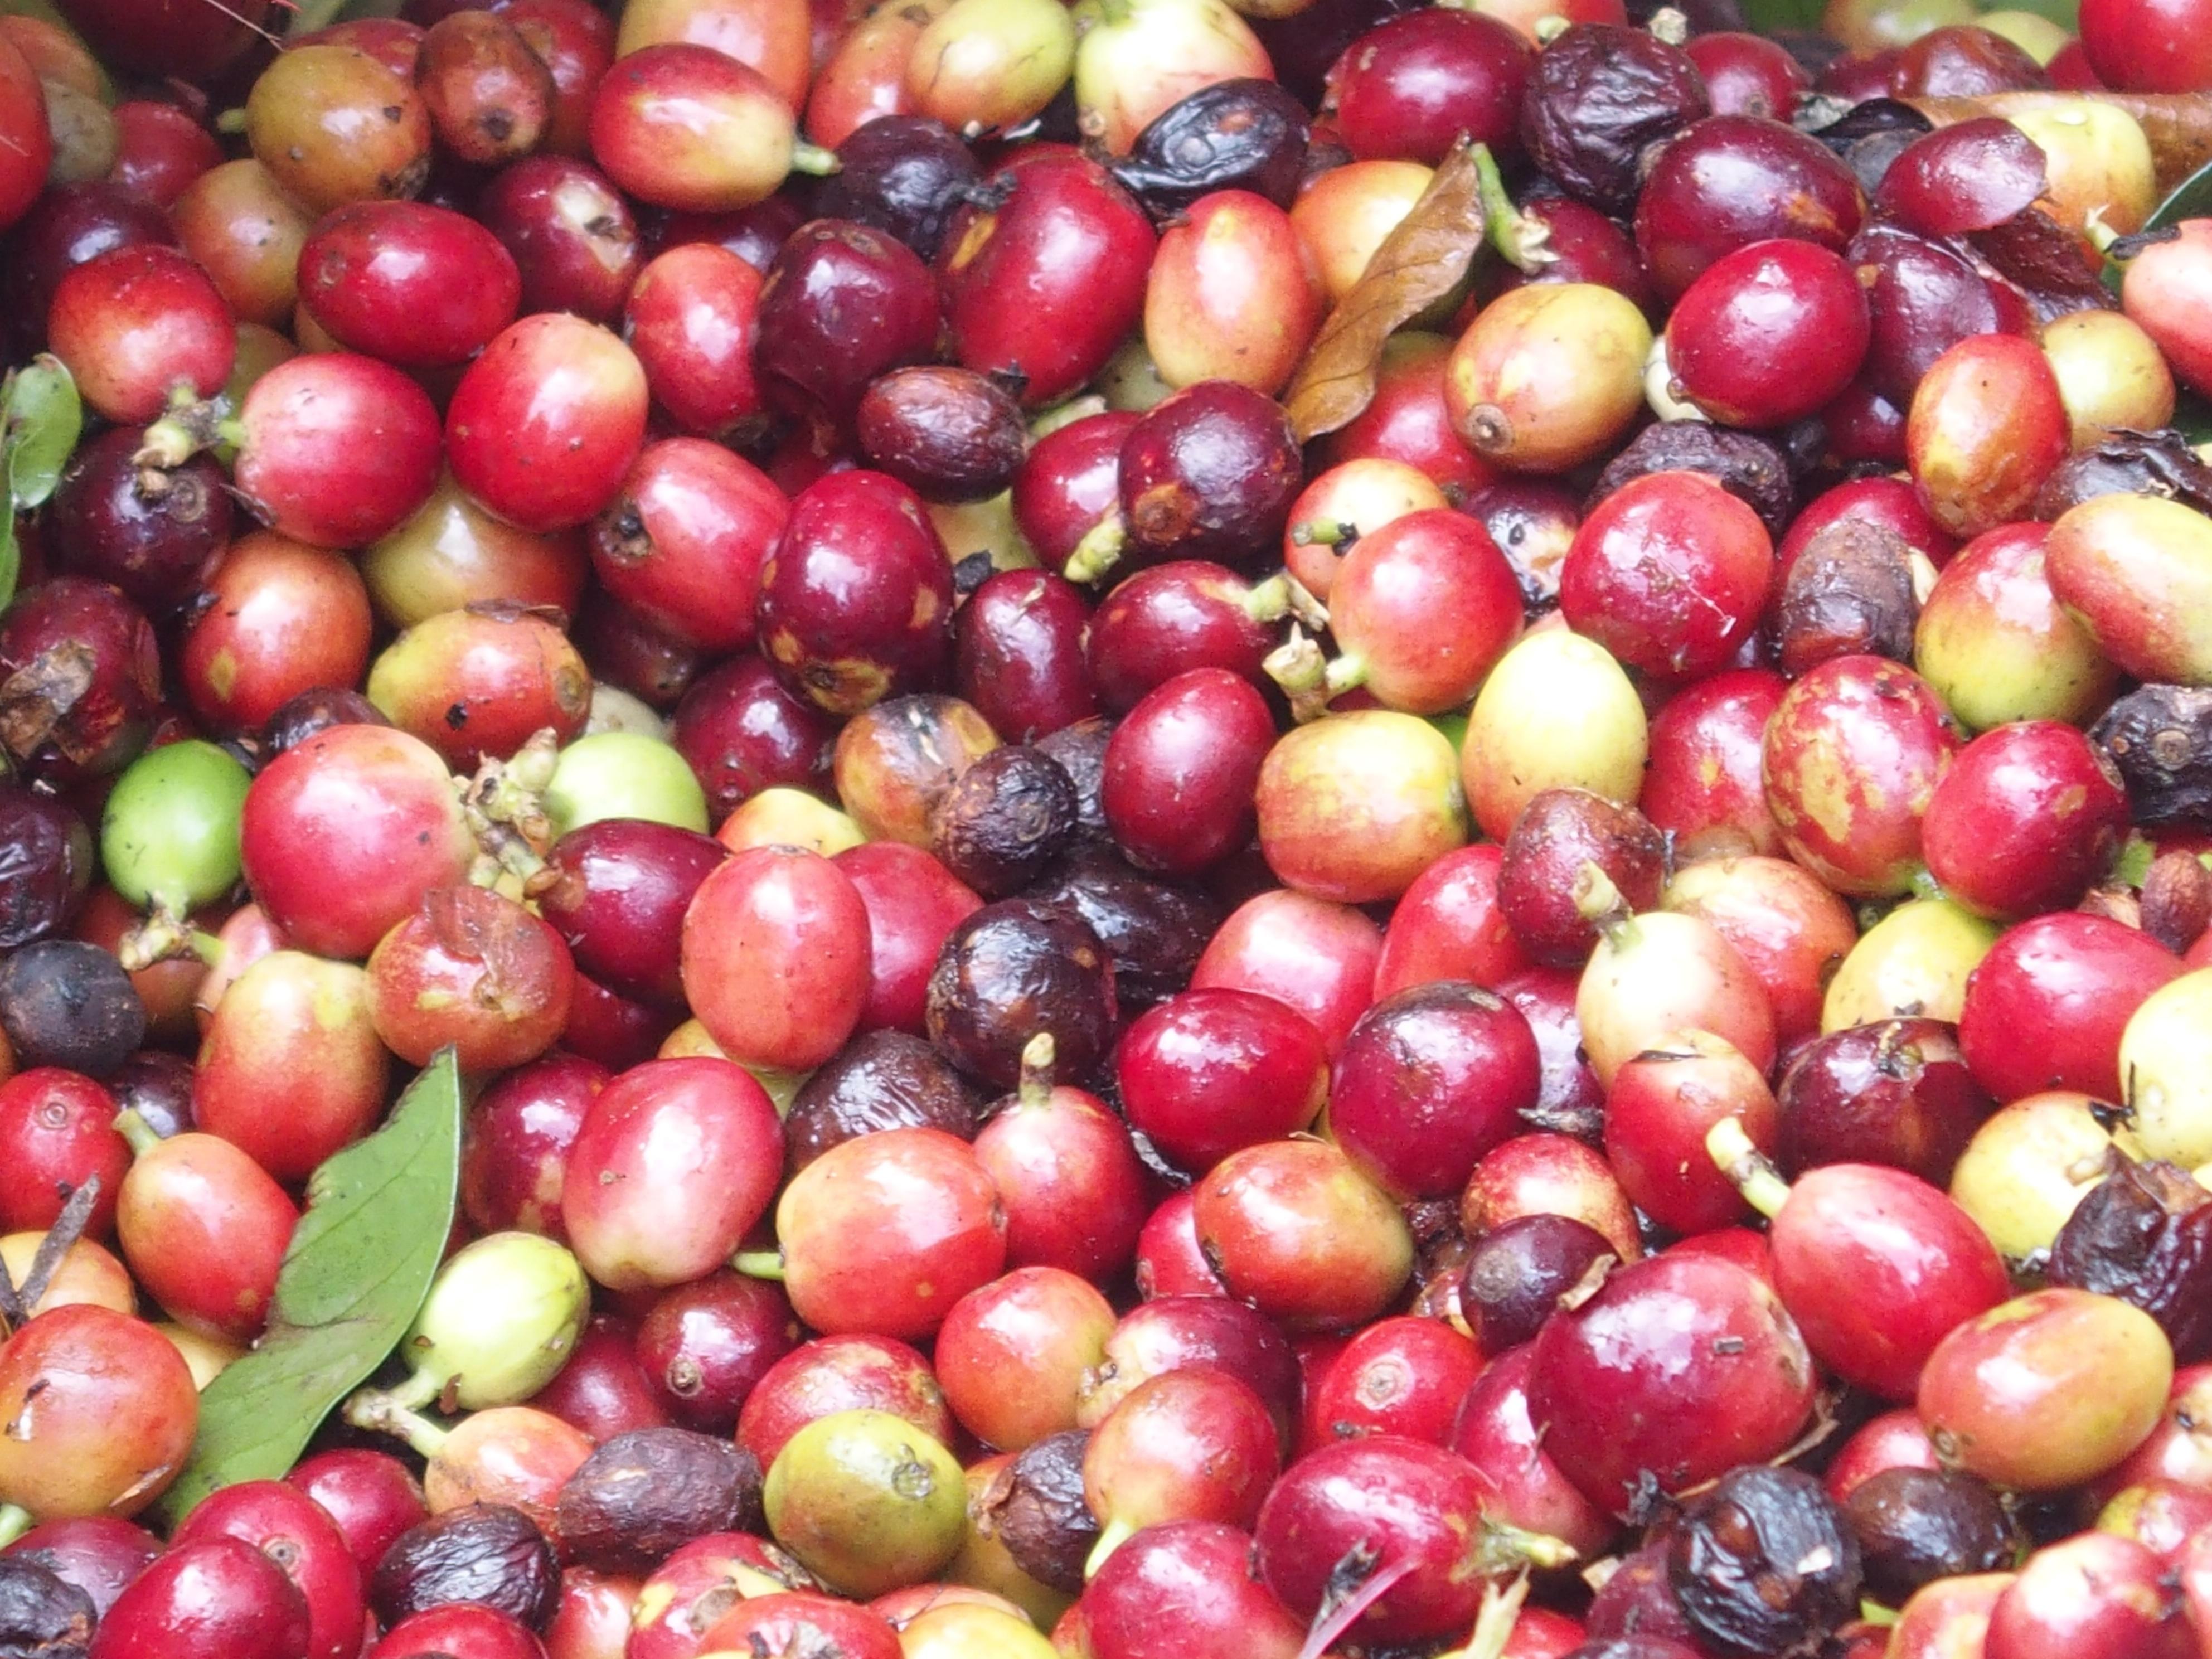 Coffee cherries on the tree